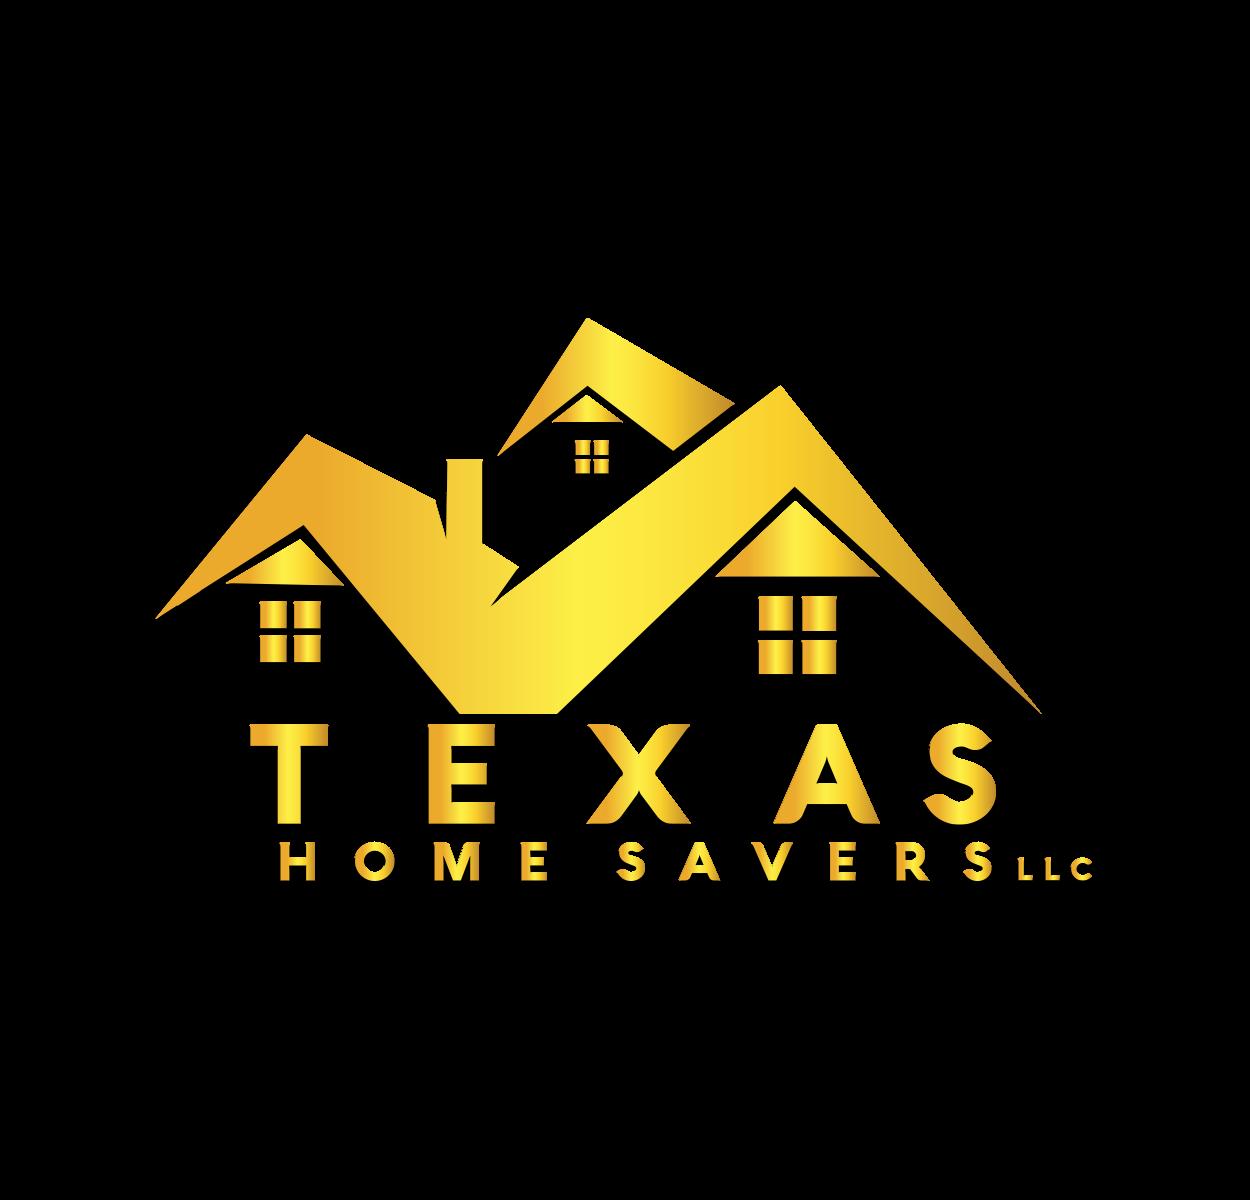 Texas Home Savers LLC